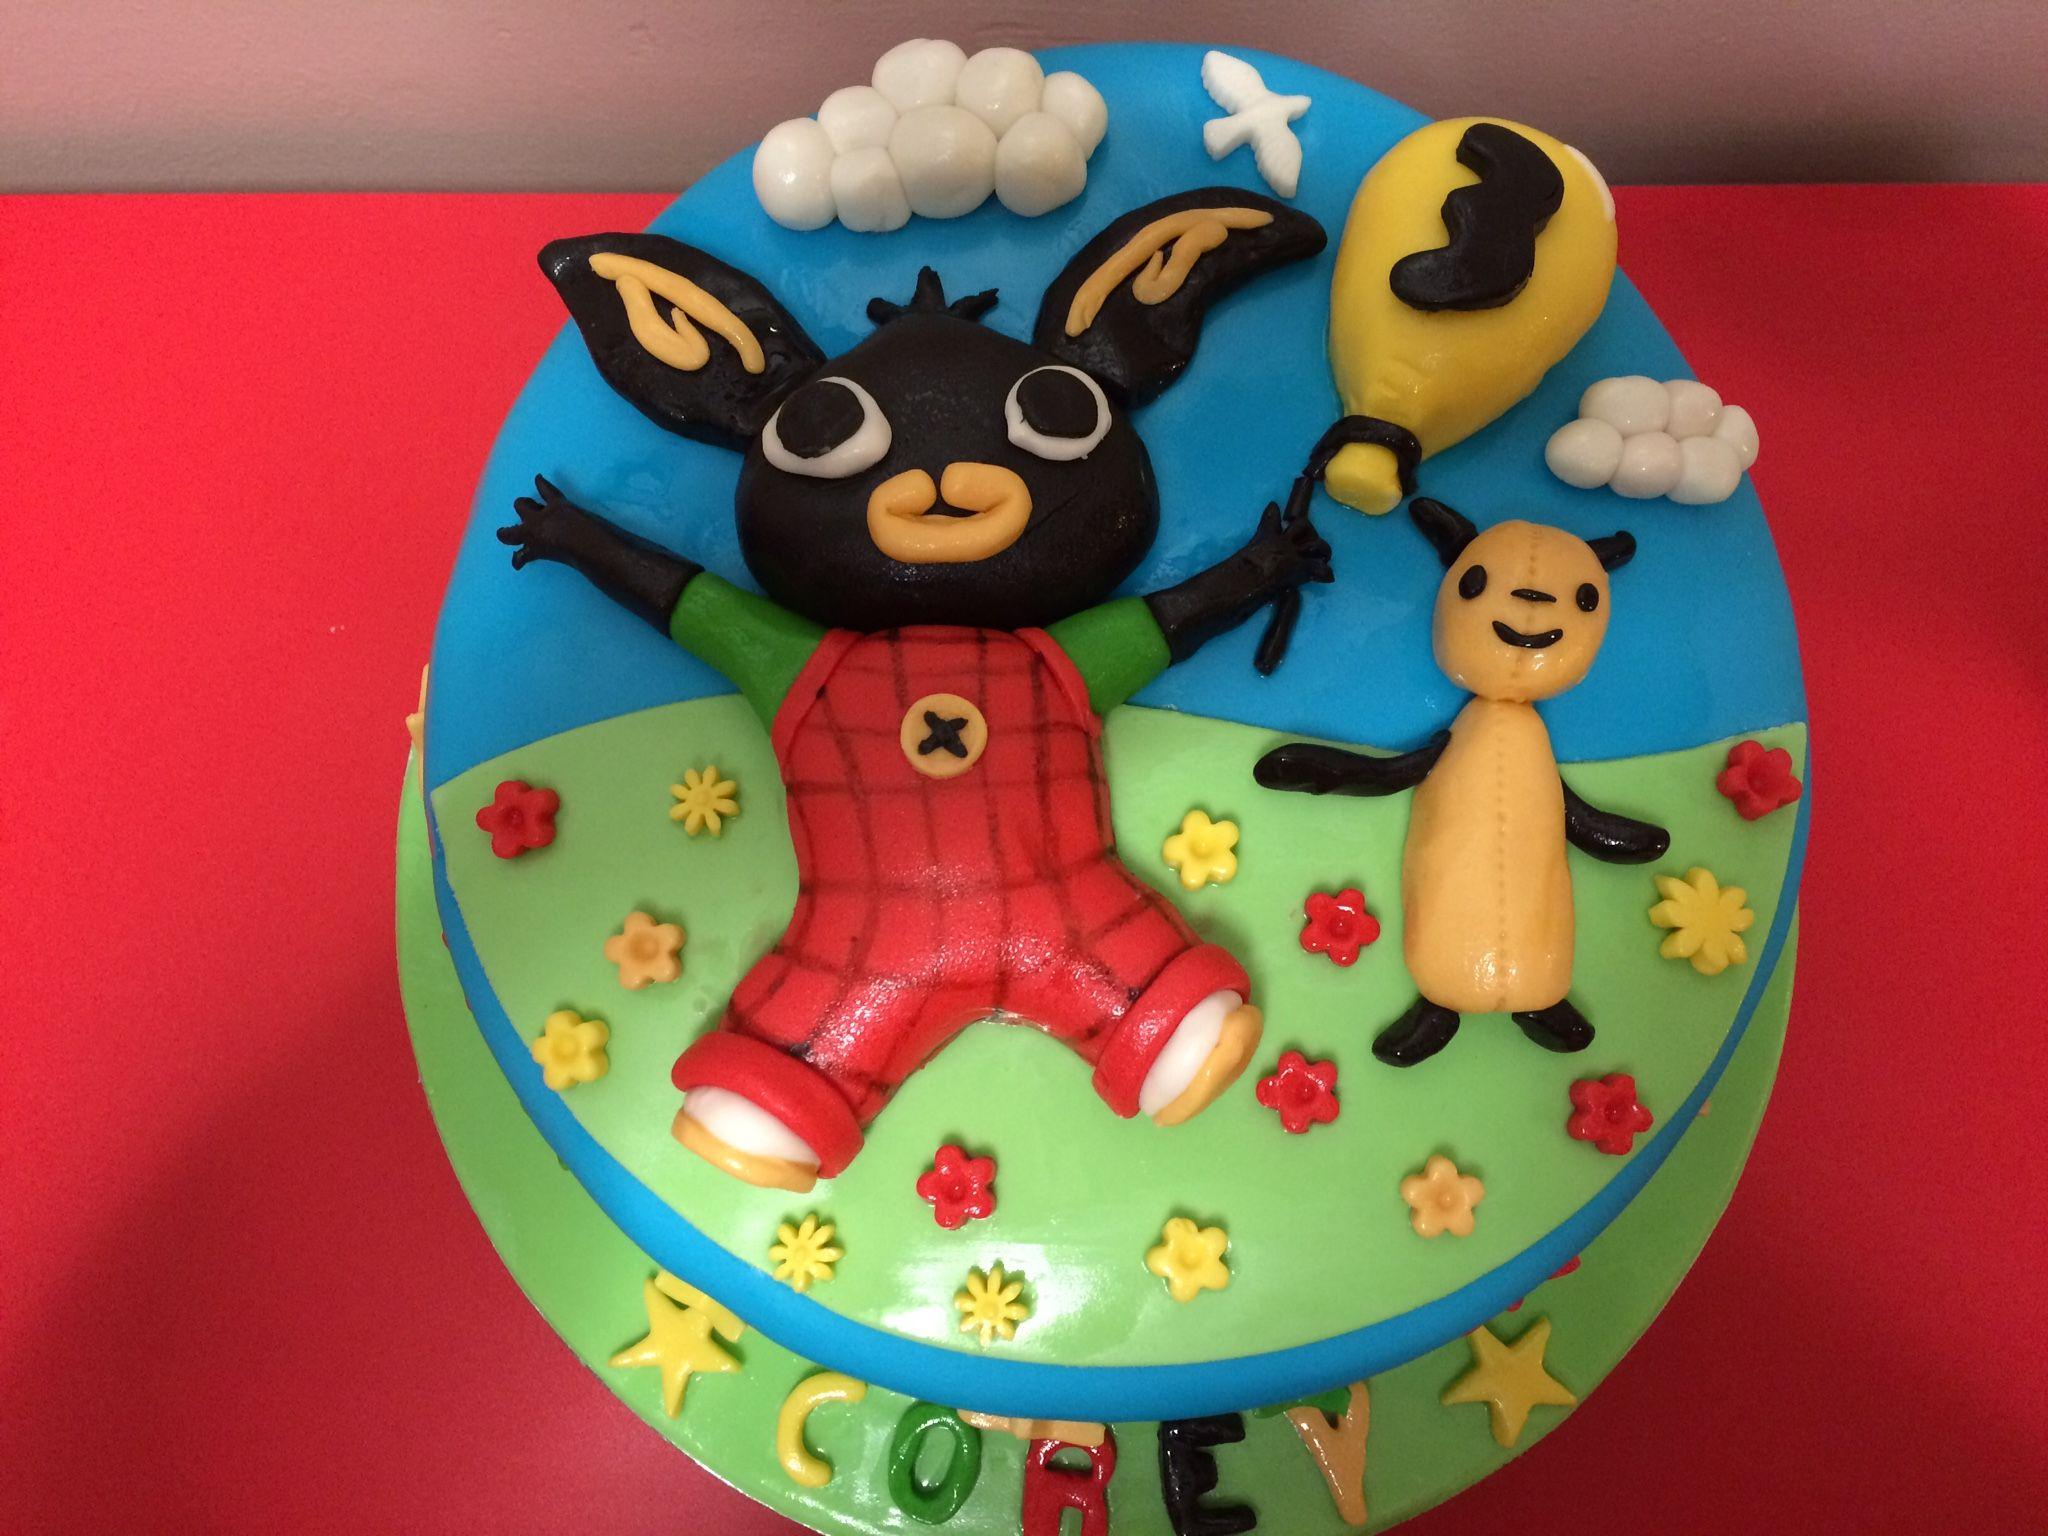 Bing bunny cake Shazscakesofchepstowweeblycom Baking Pinterest